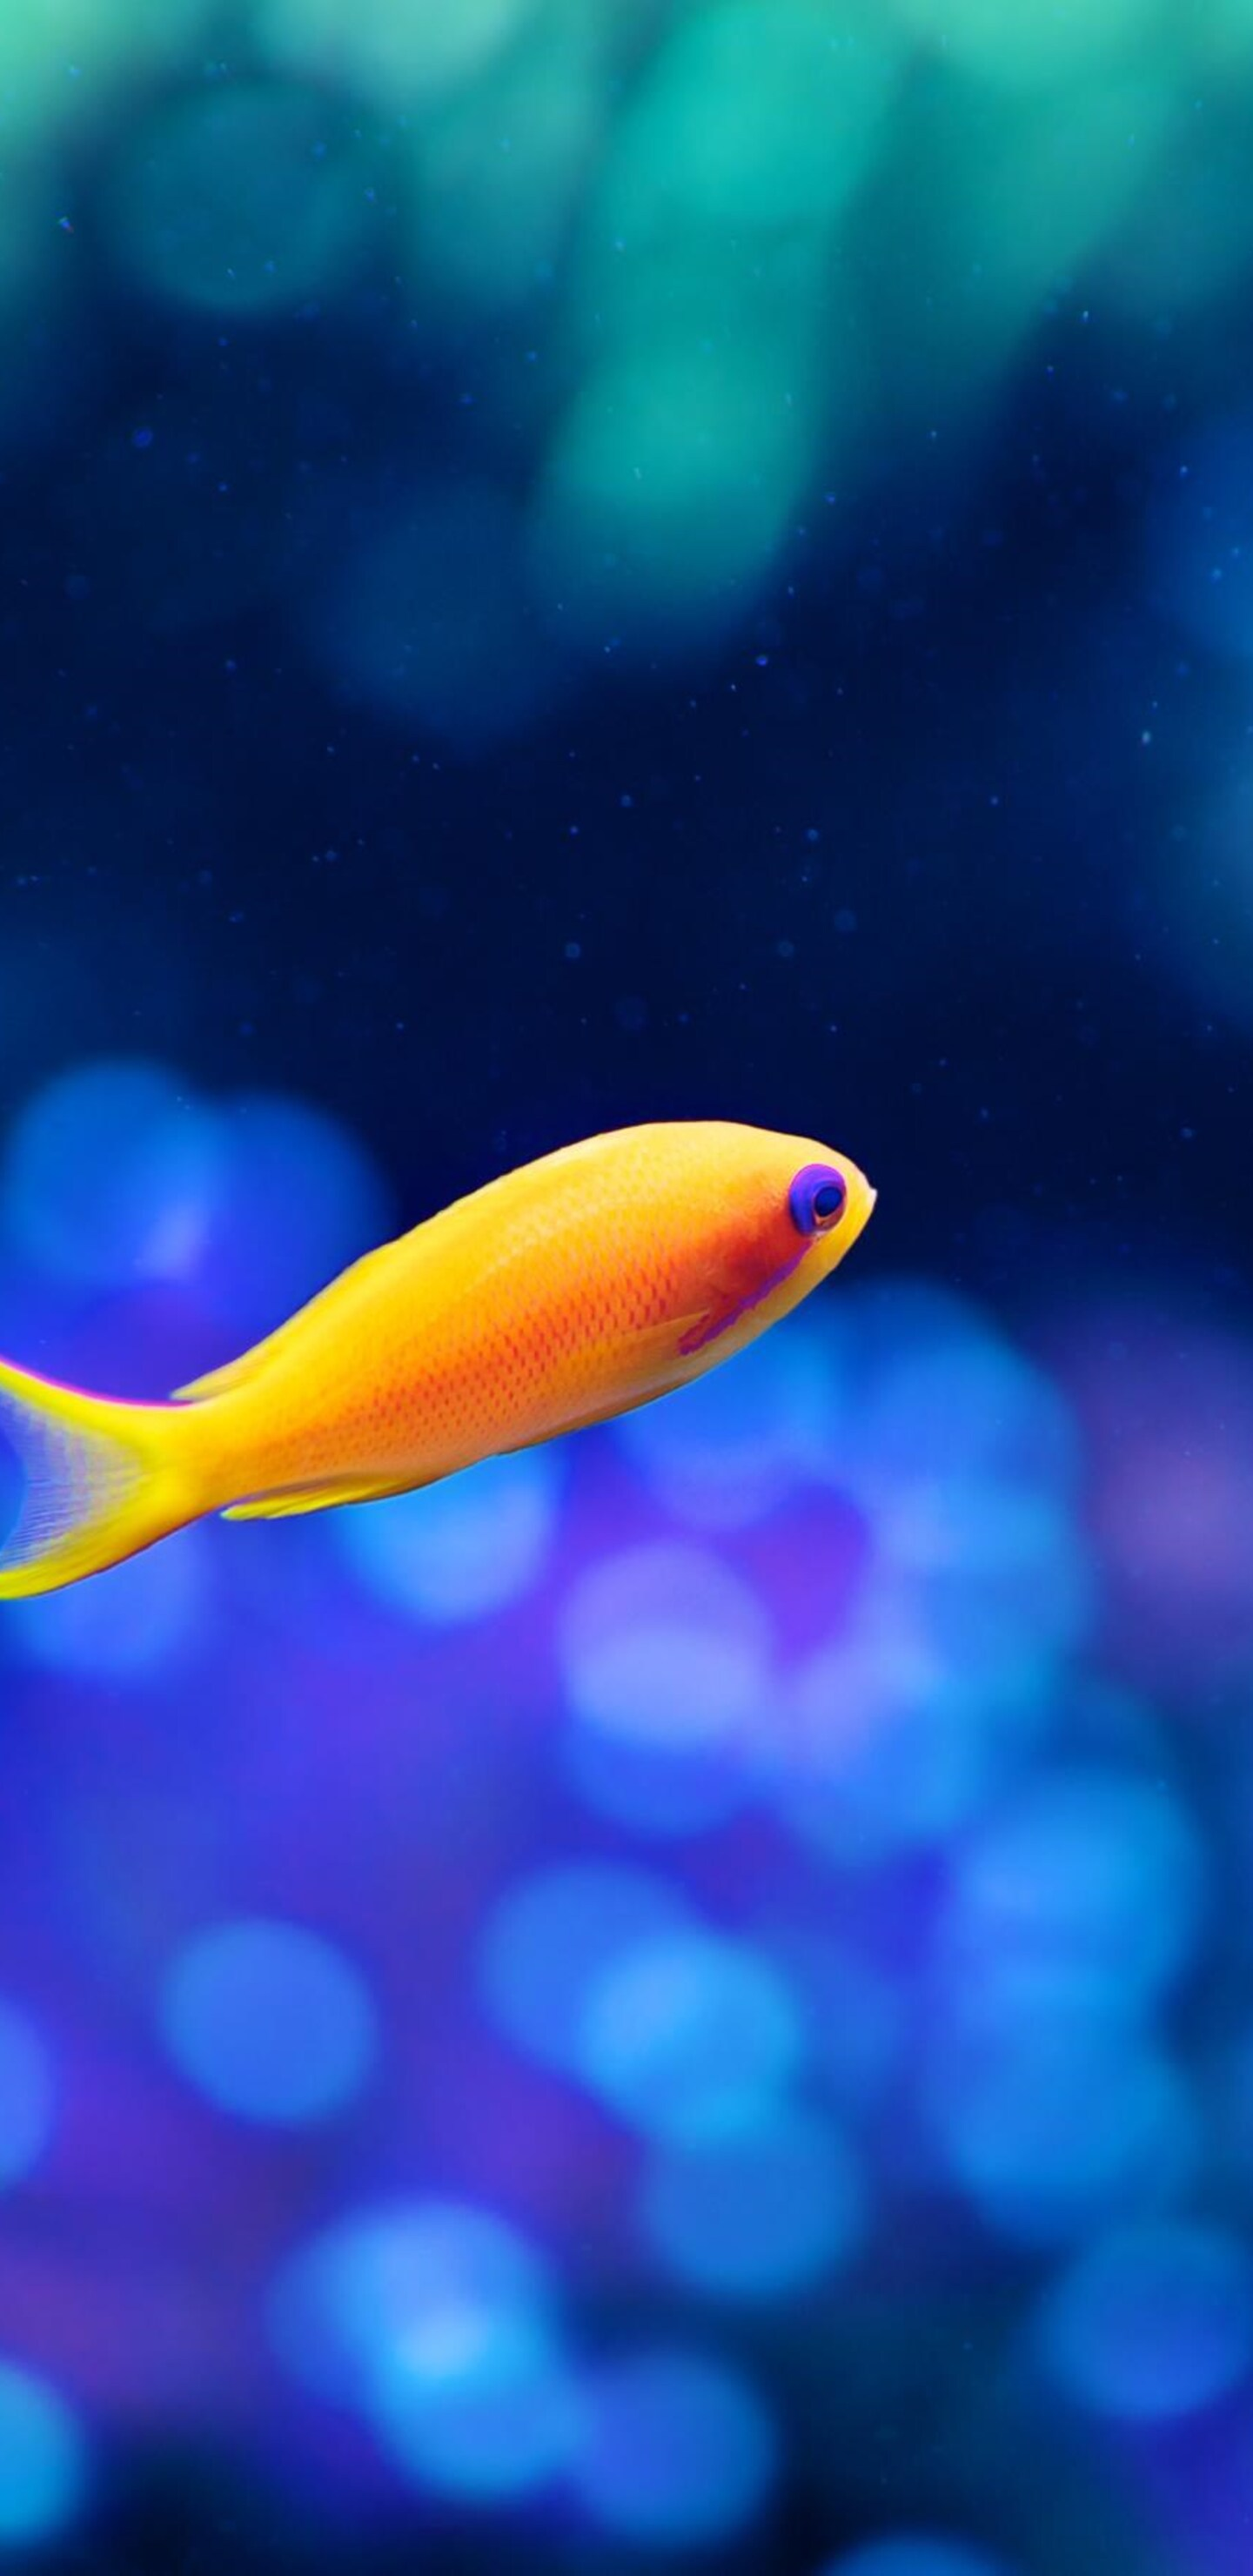 1440x2960 Little Fancy Fish Samsung Galaxy Note 9 8 S9 S8 S8 Qhd